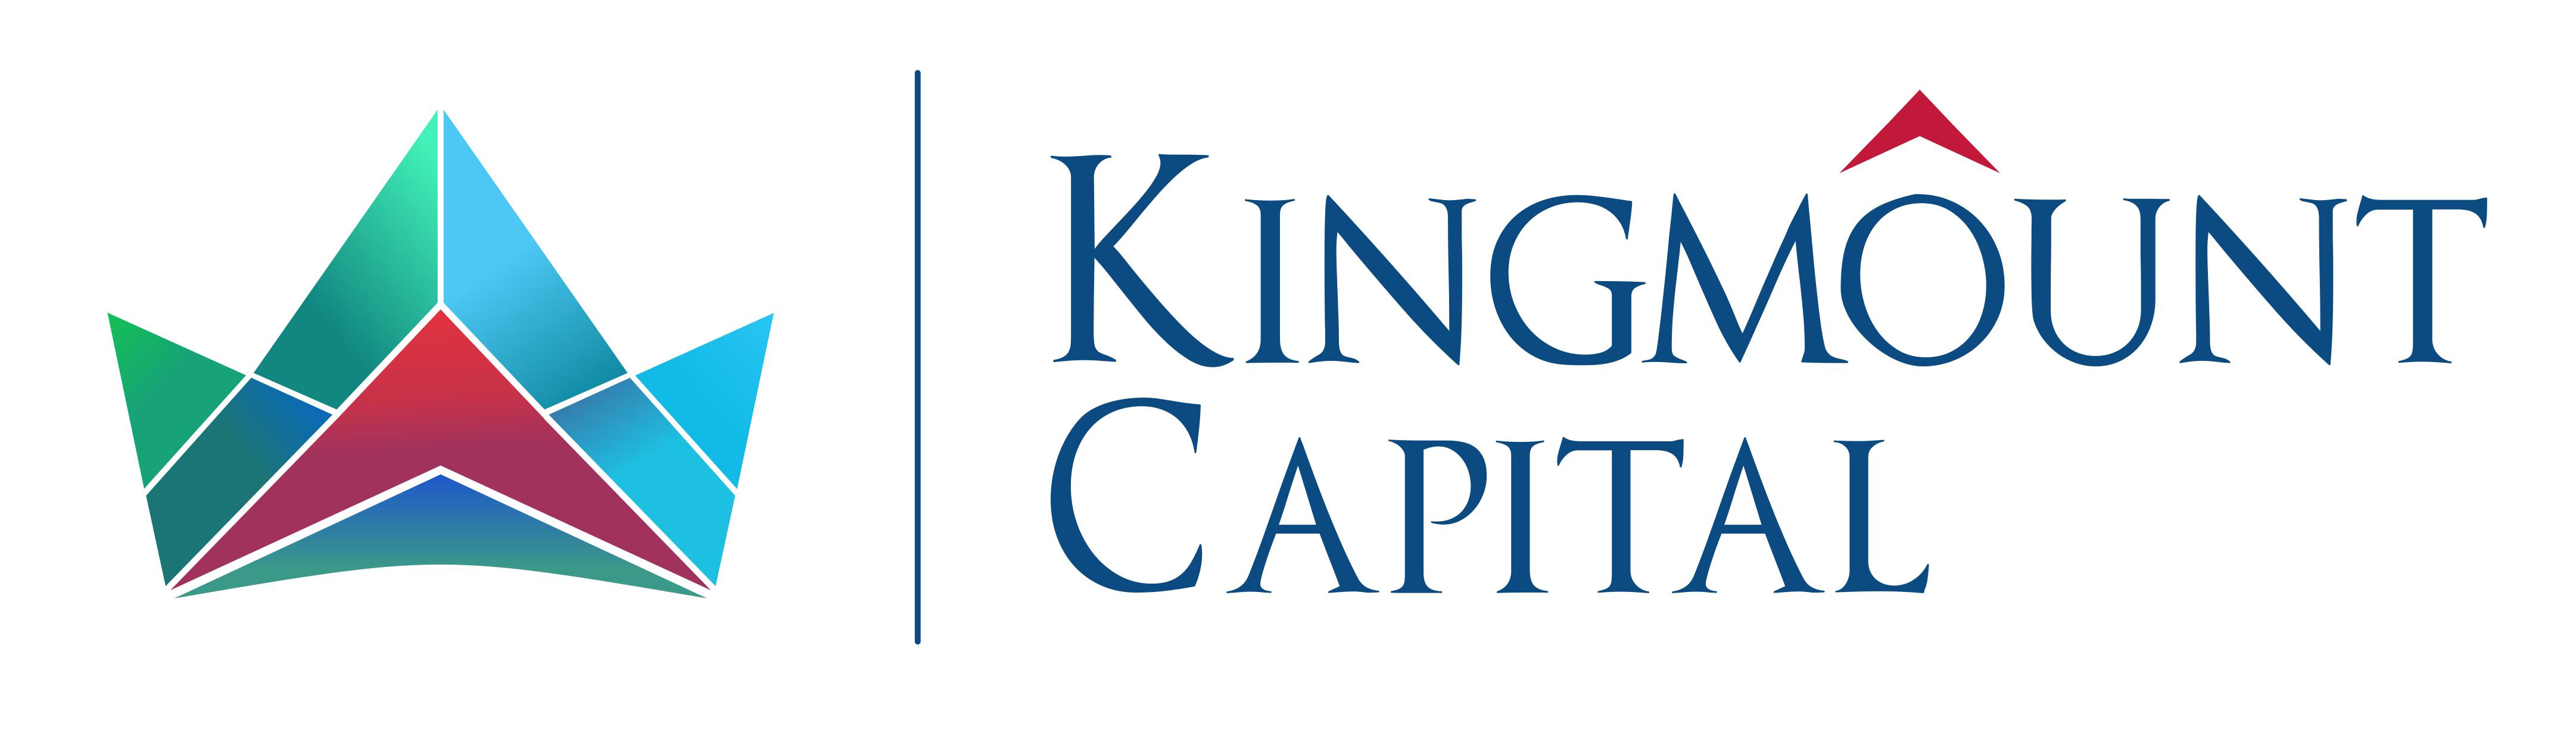 kingmountcapital-logo